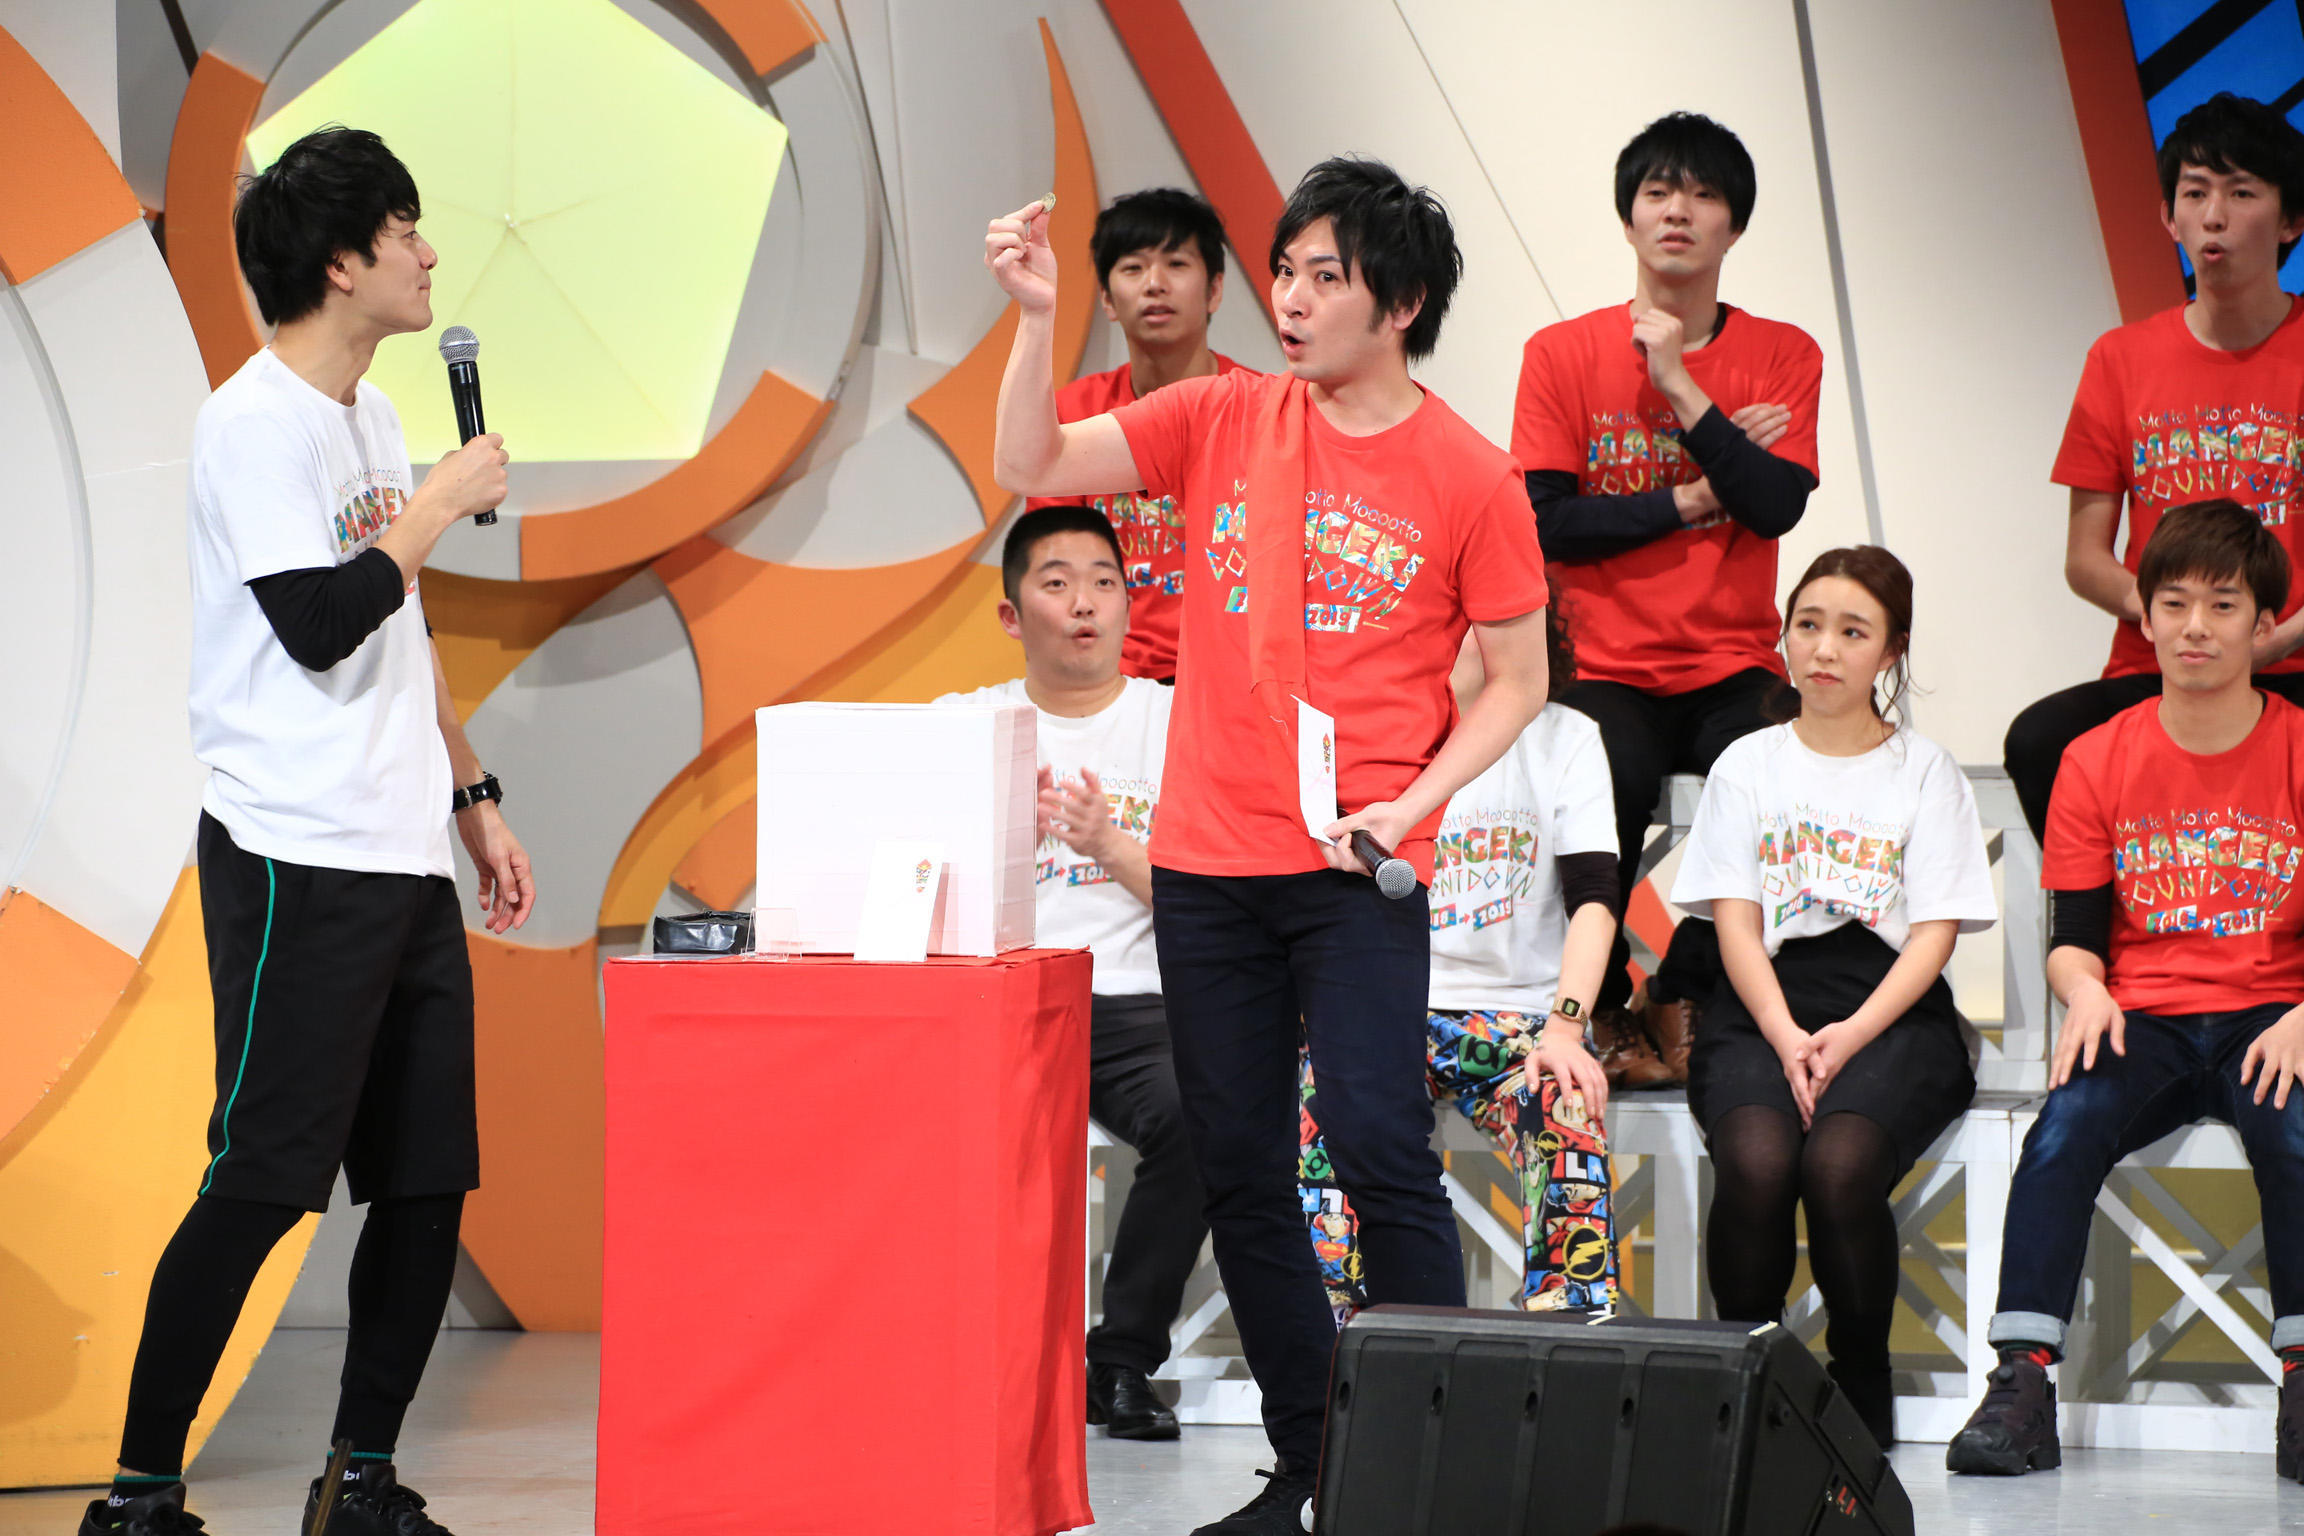 http://news.yoshimoto.co.jp/20190101105551-346ae69c17f3ddc9aa7f8aaa432a179b828d71b5.jpg